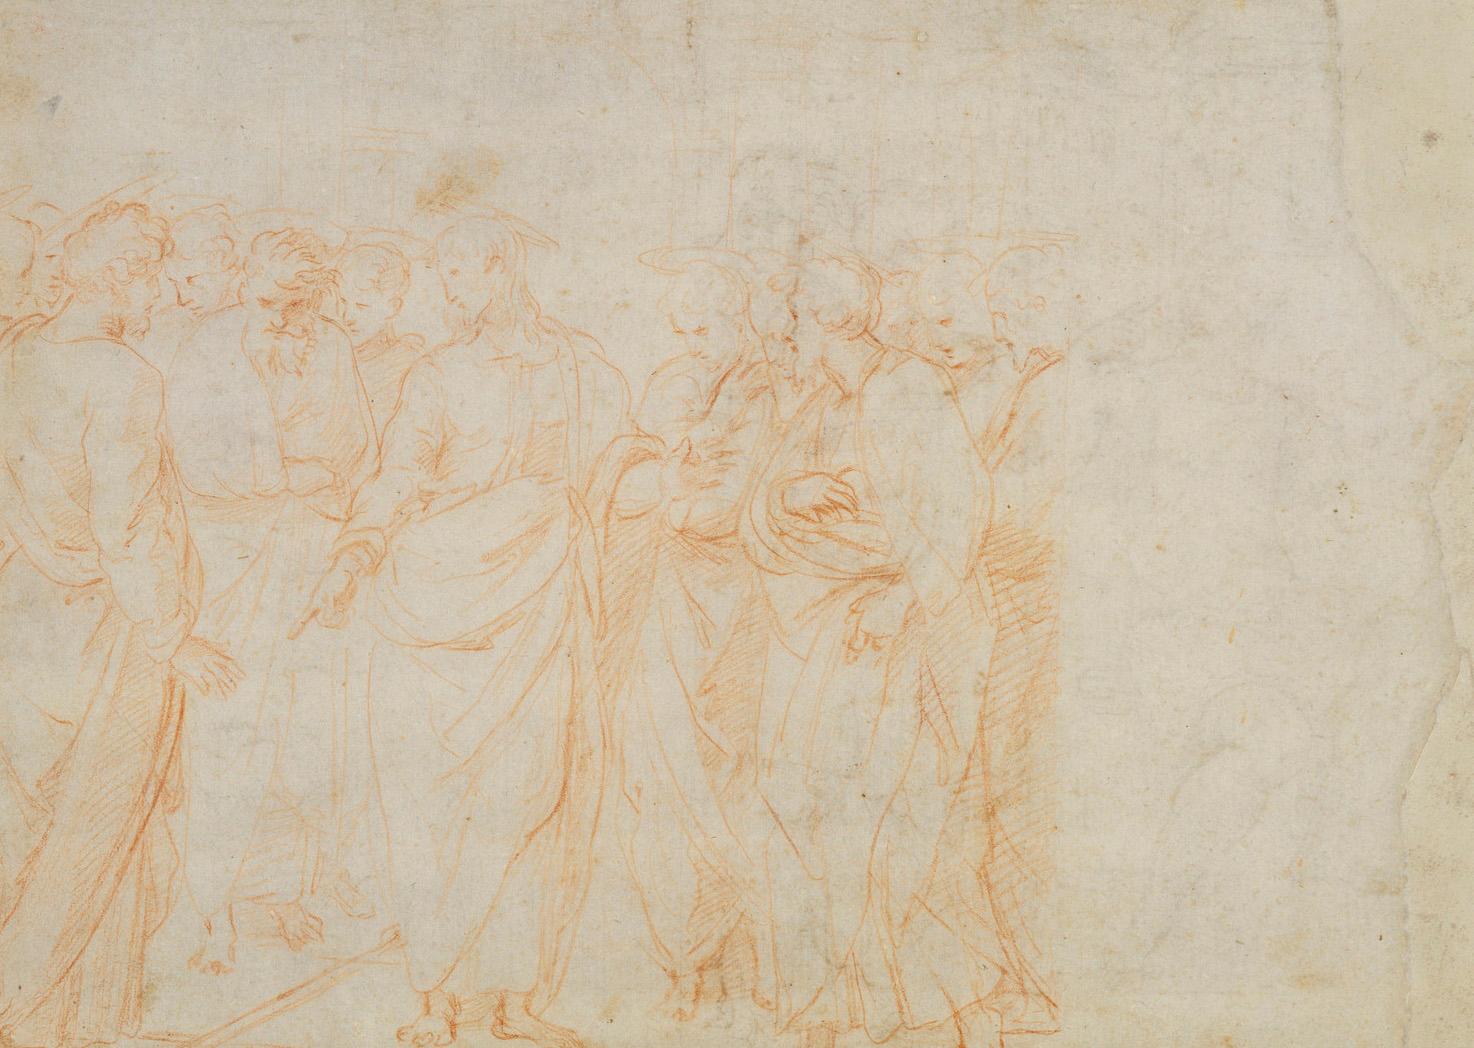 Raphael-Urbino---Sketch---Doctrine-of-the-2-Swords.jpg